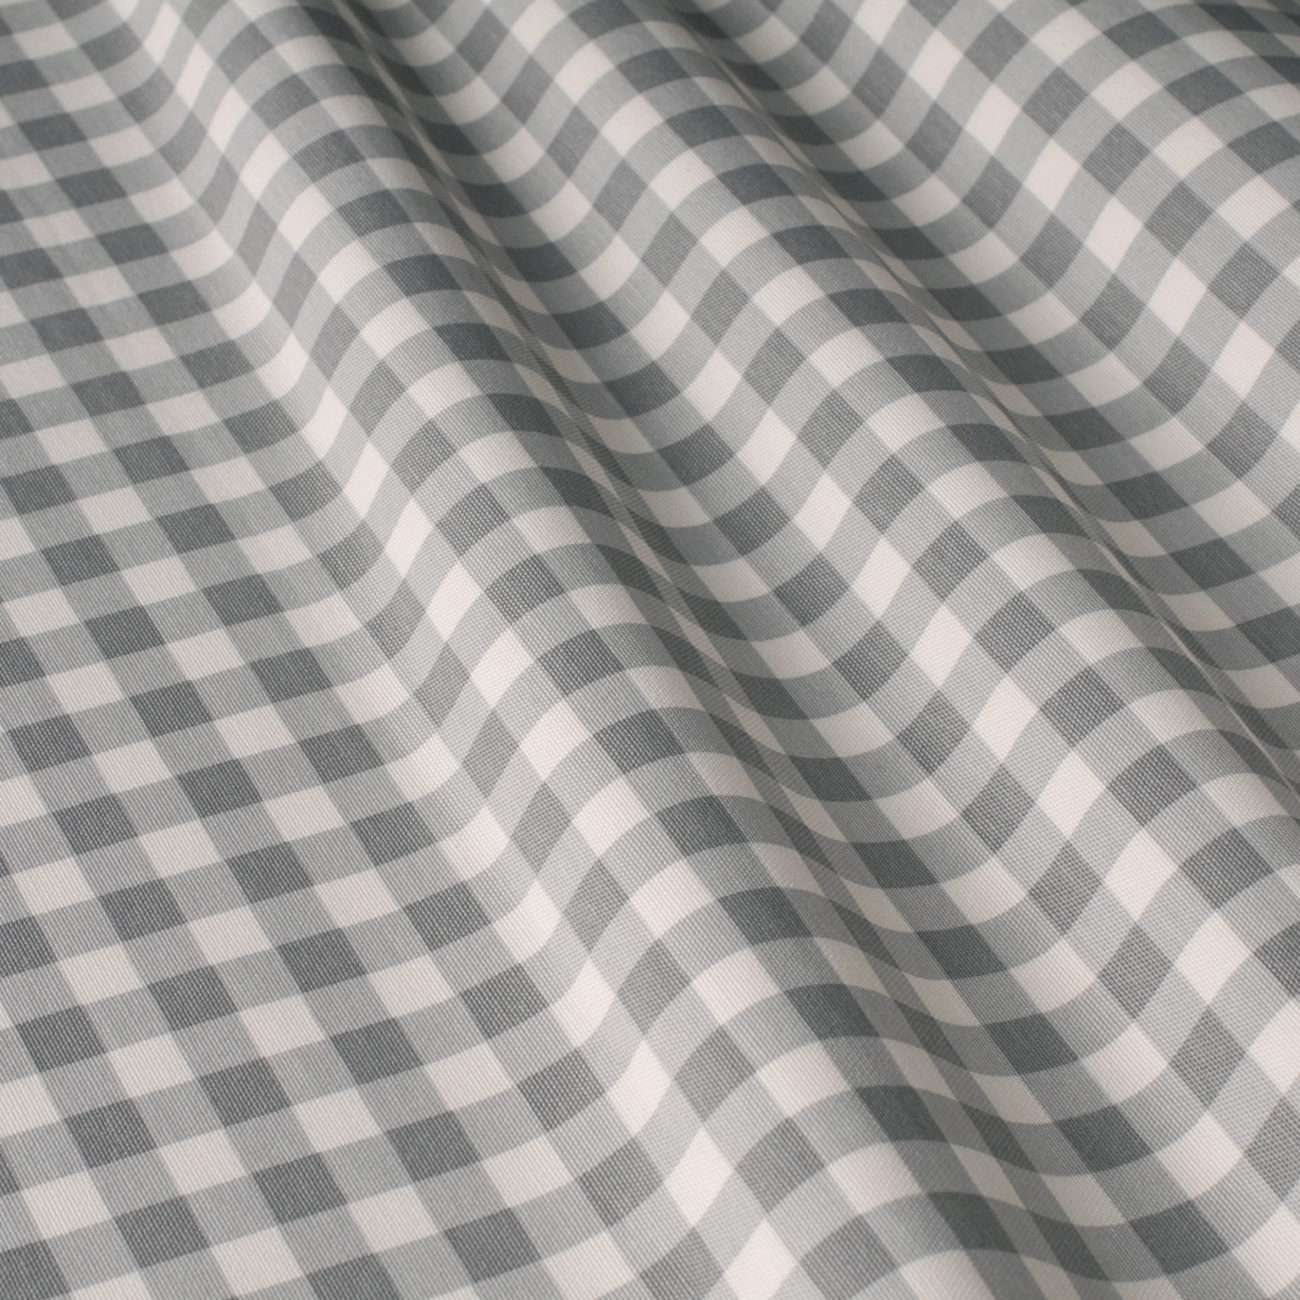 MantelBISTROT GRIS ■1,3cm Rectangular 1,8x3,2 m [enstock] [envíorápido]